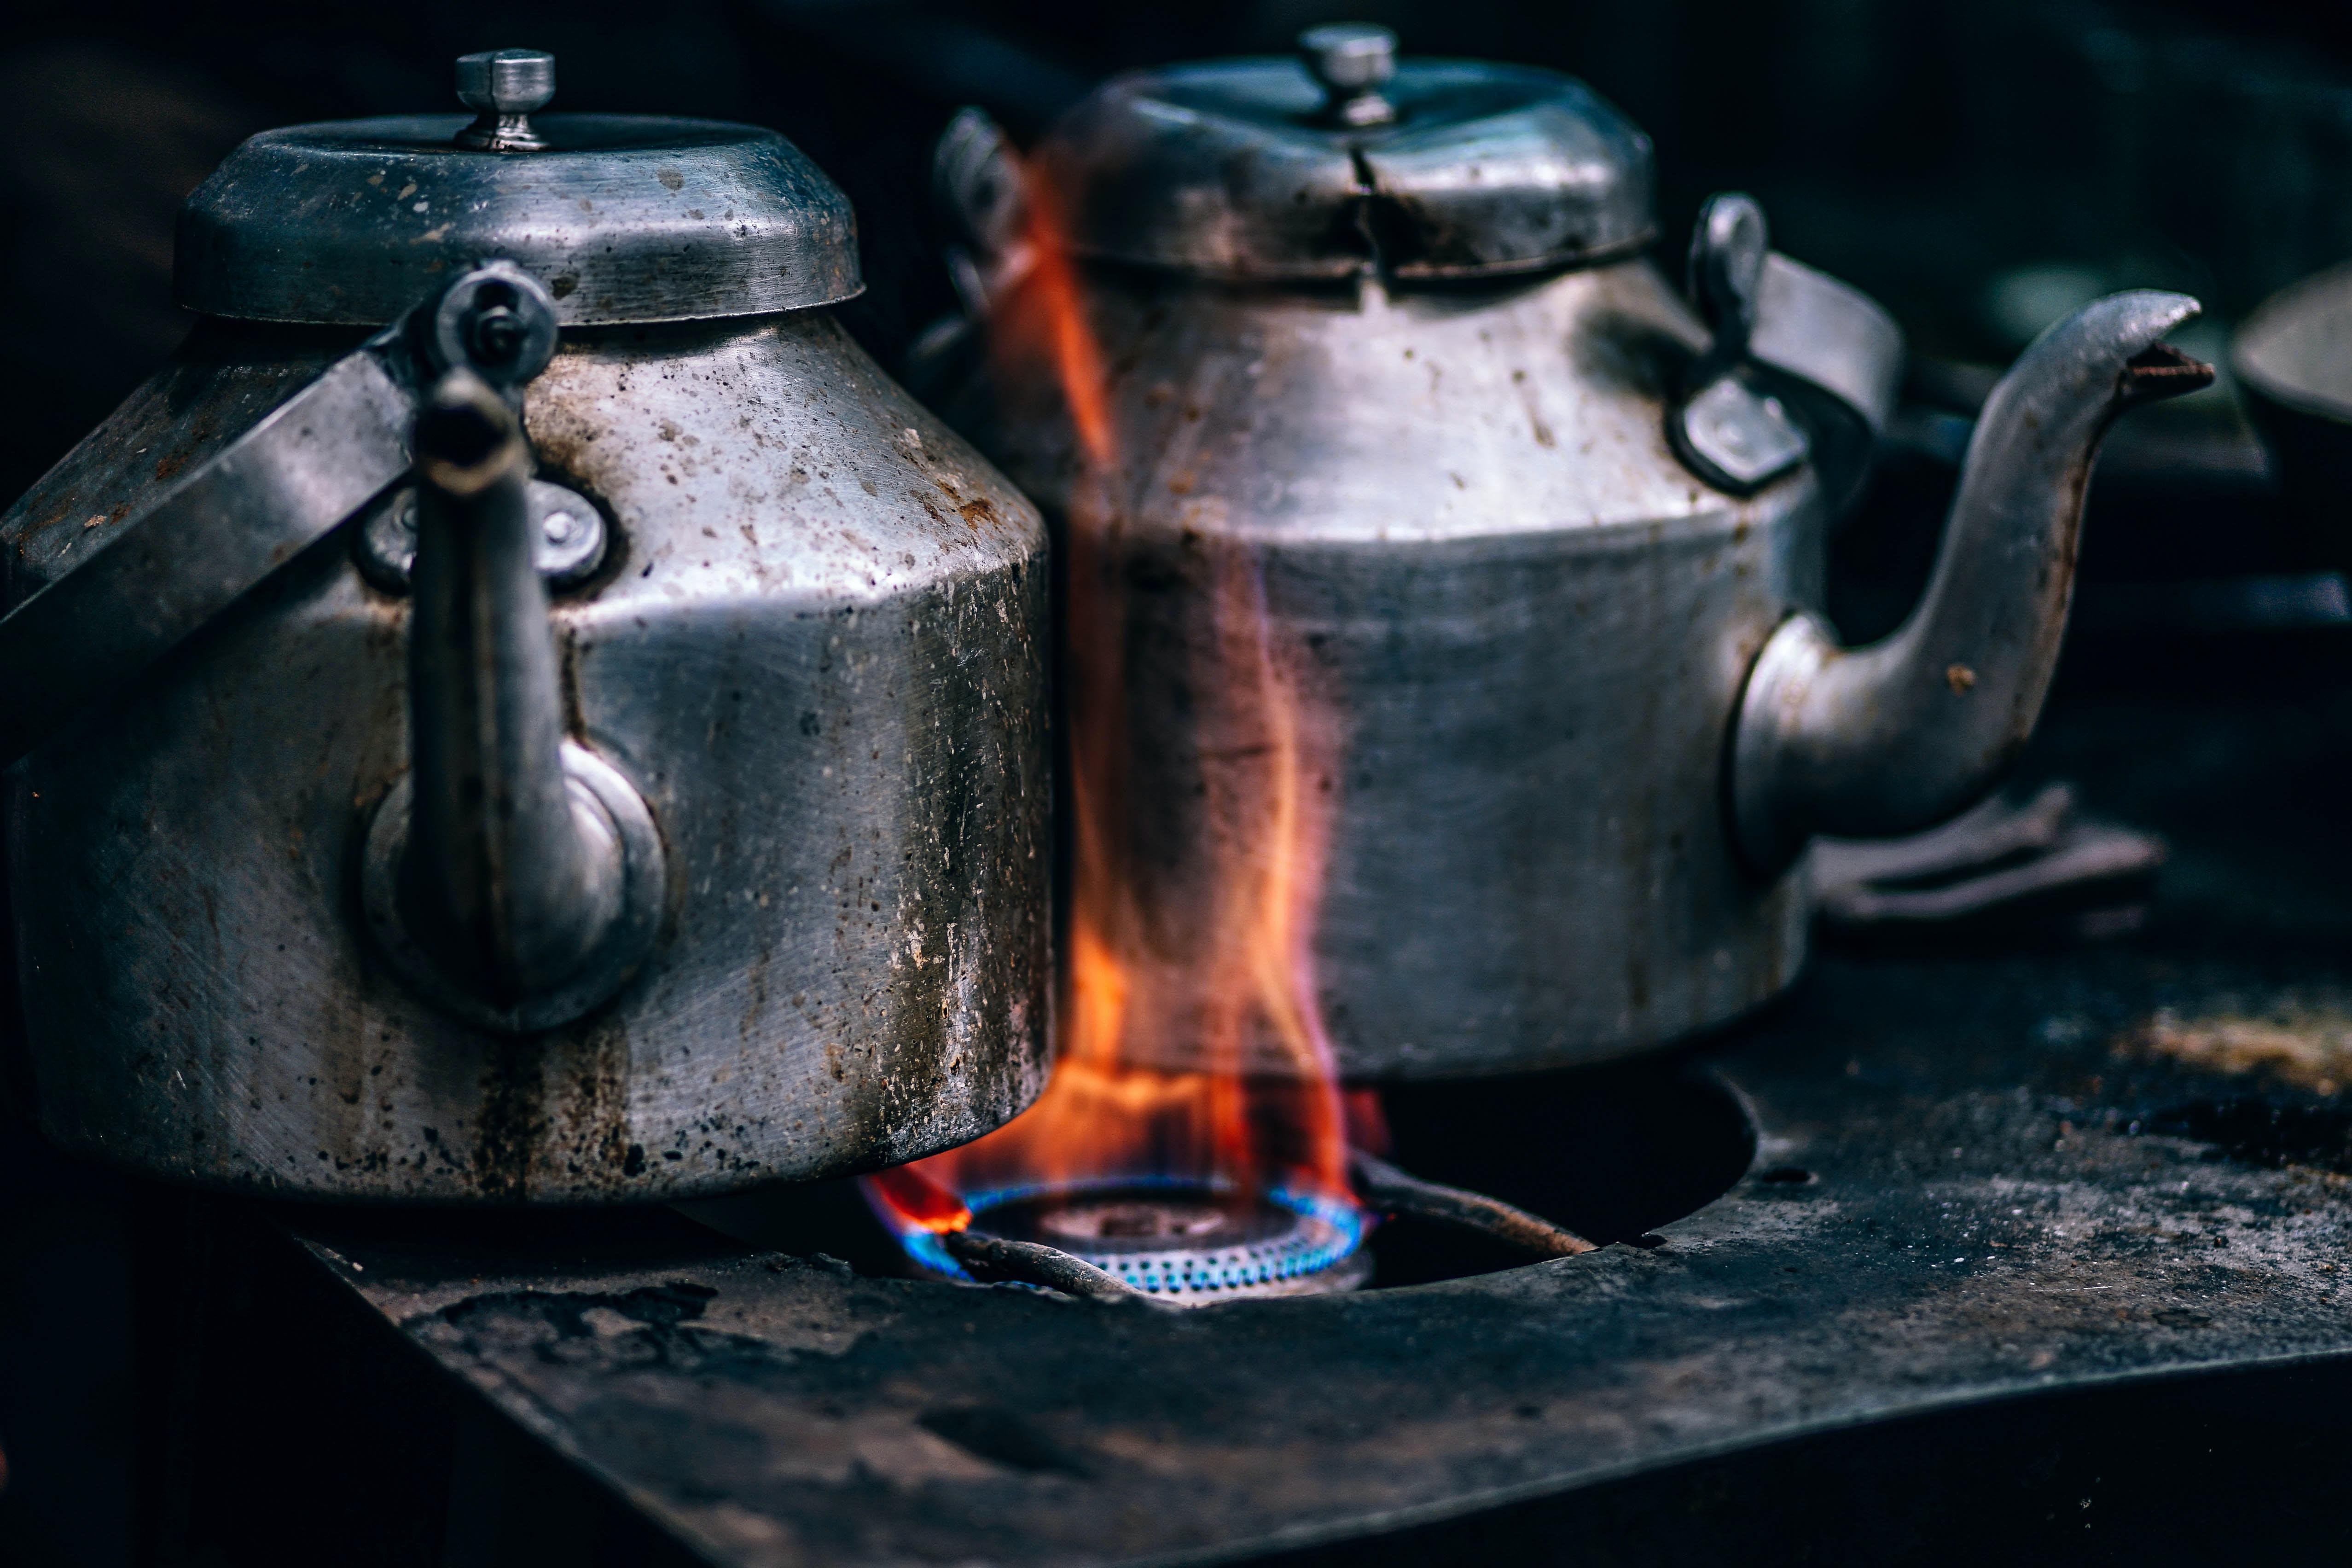 Rustic metal tea pots on an open flame